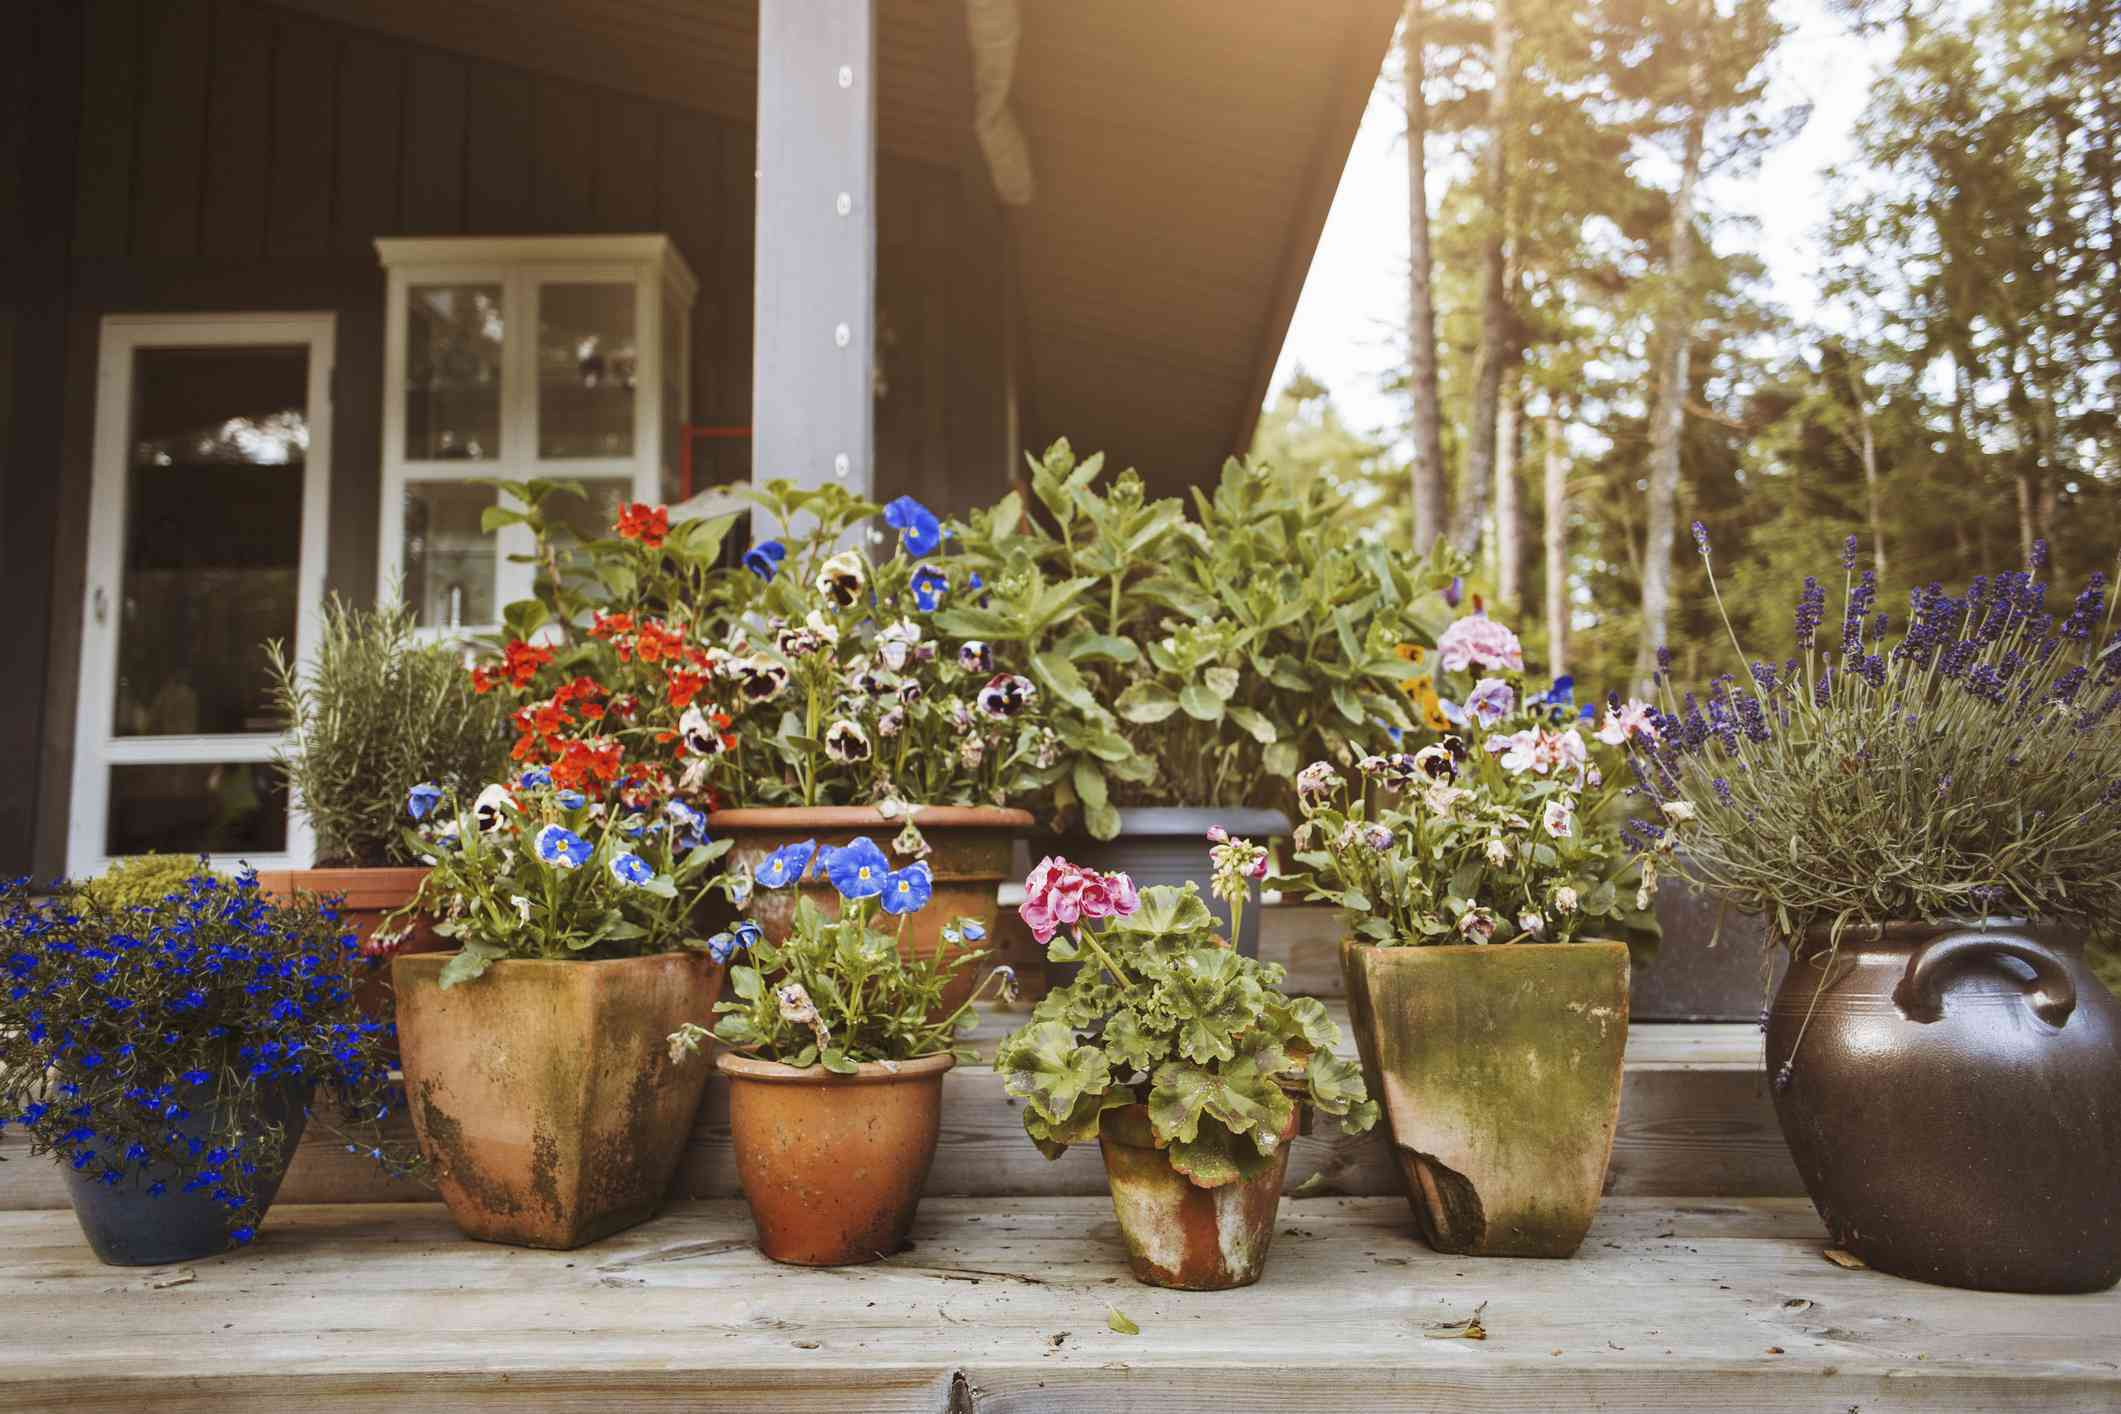 Flores que crecen en macetas